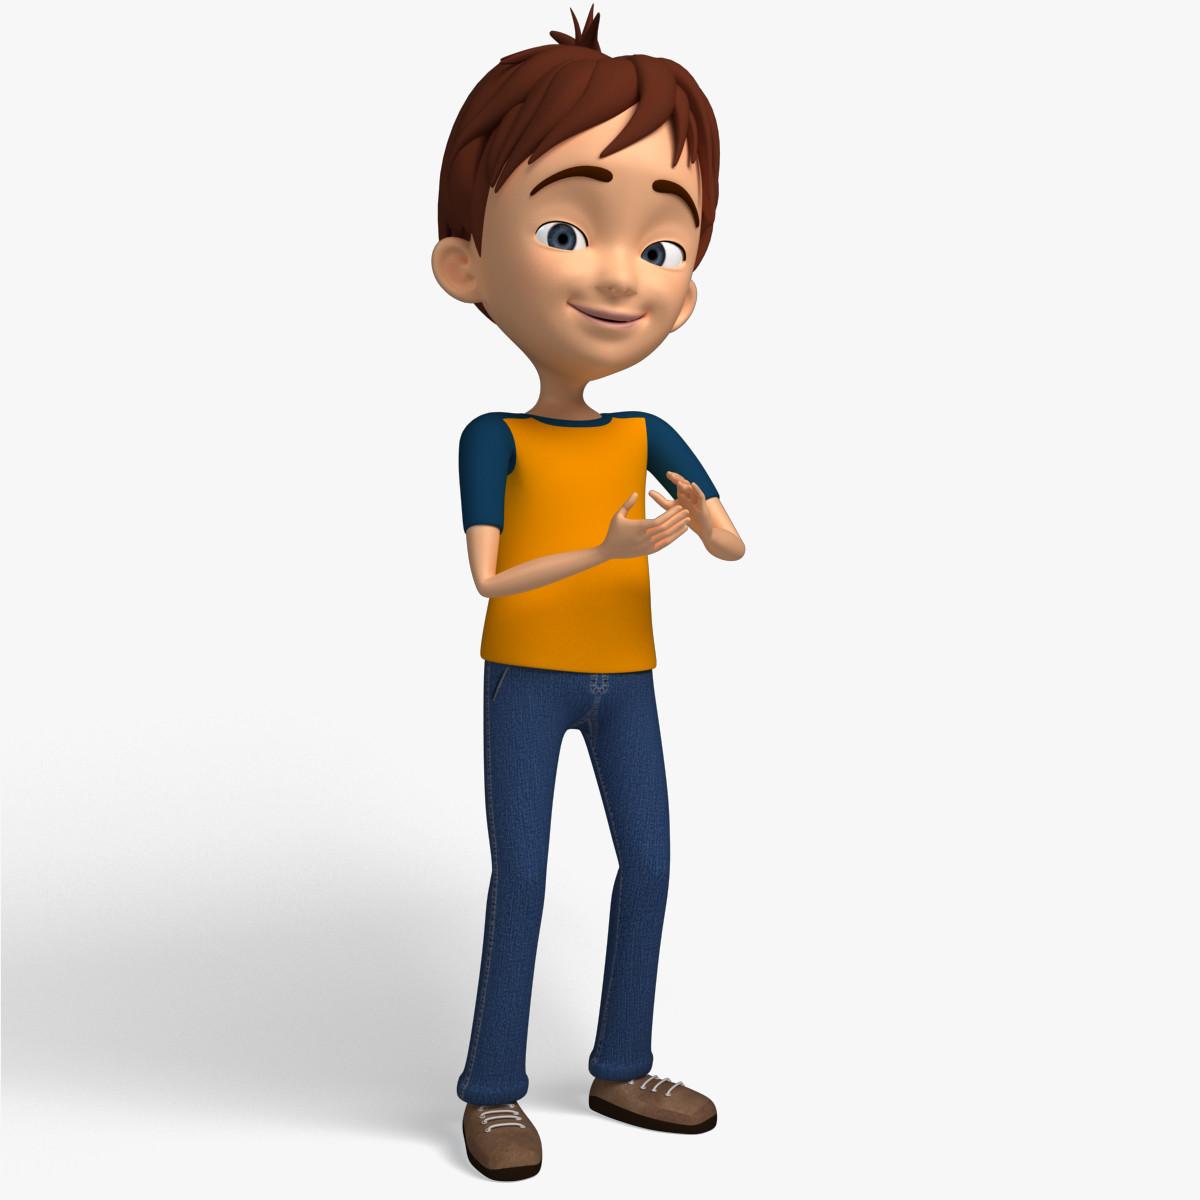 Cartoon Characters 3d Model : Cartoon character kid d model